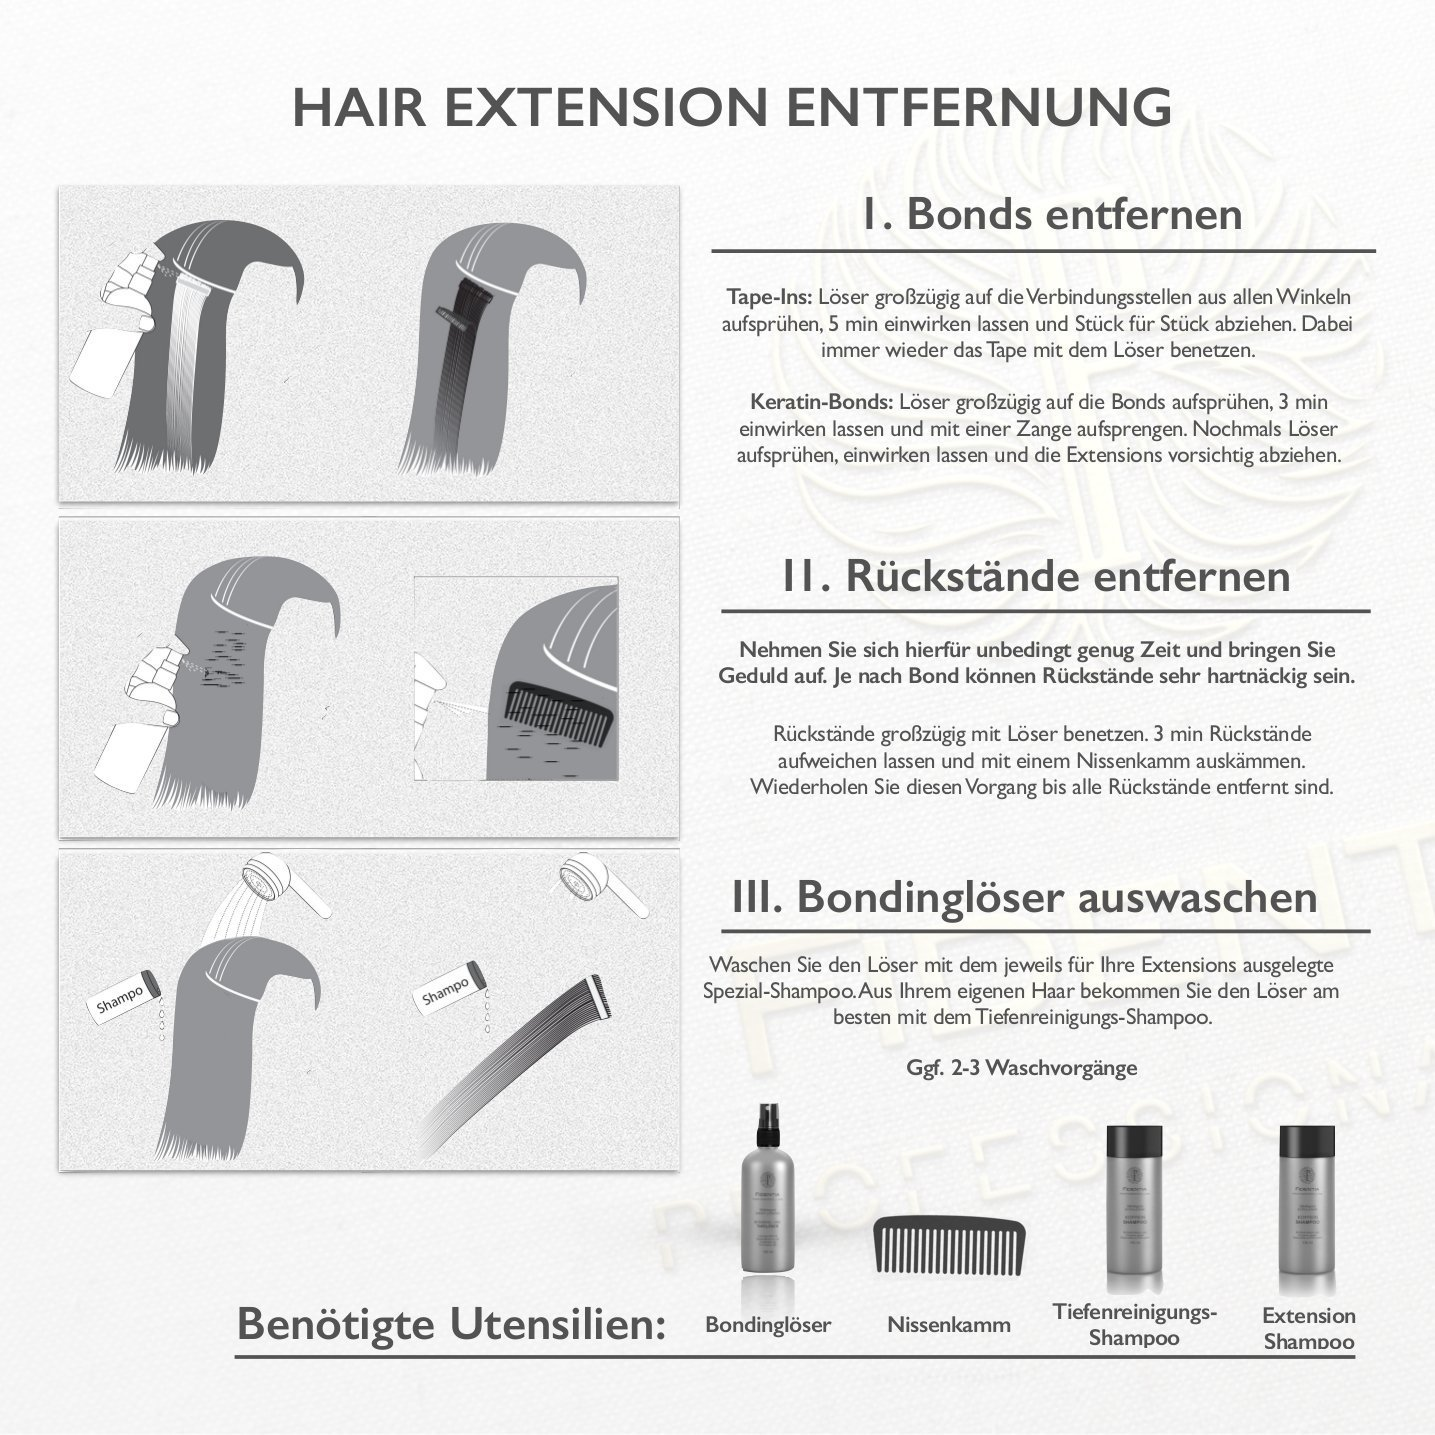 Bonding extensions entfernen